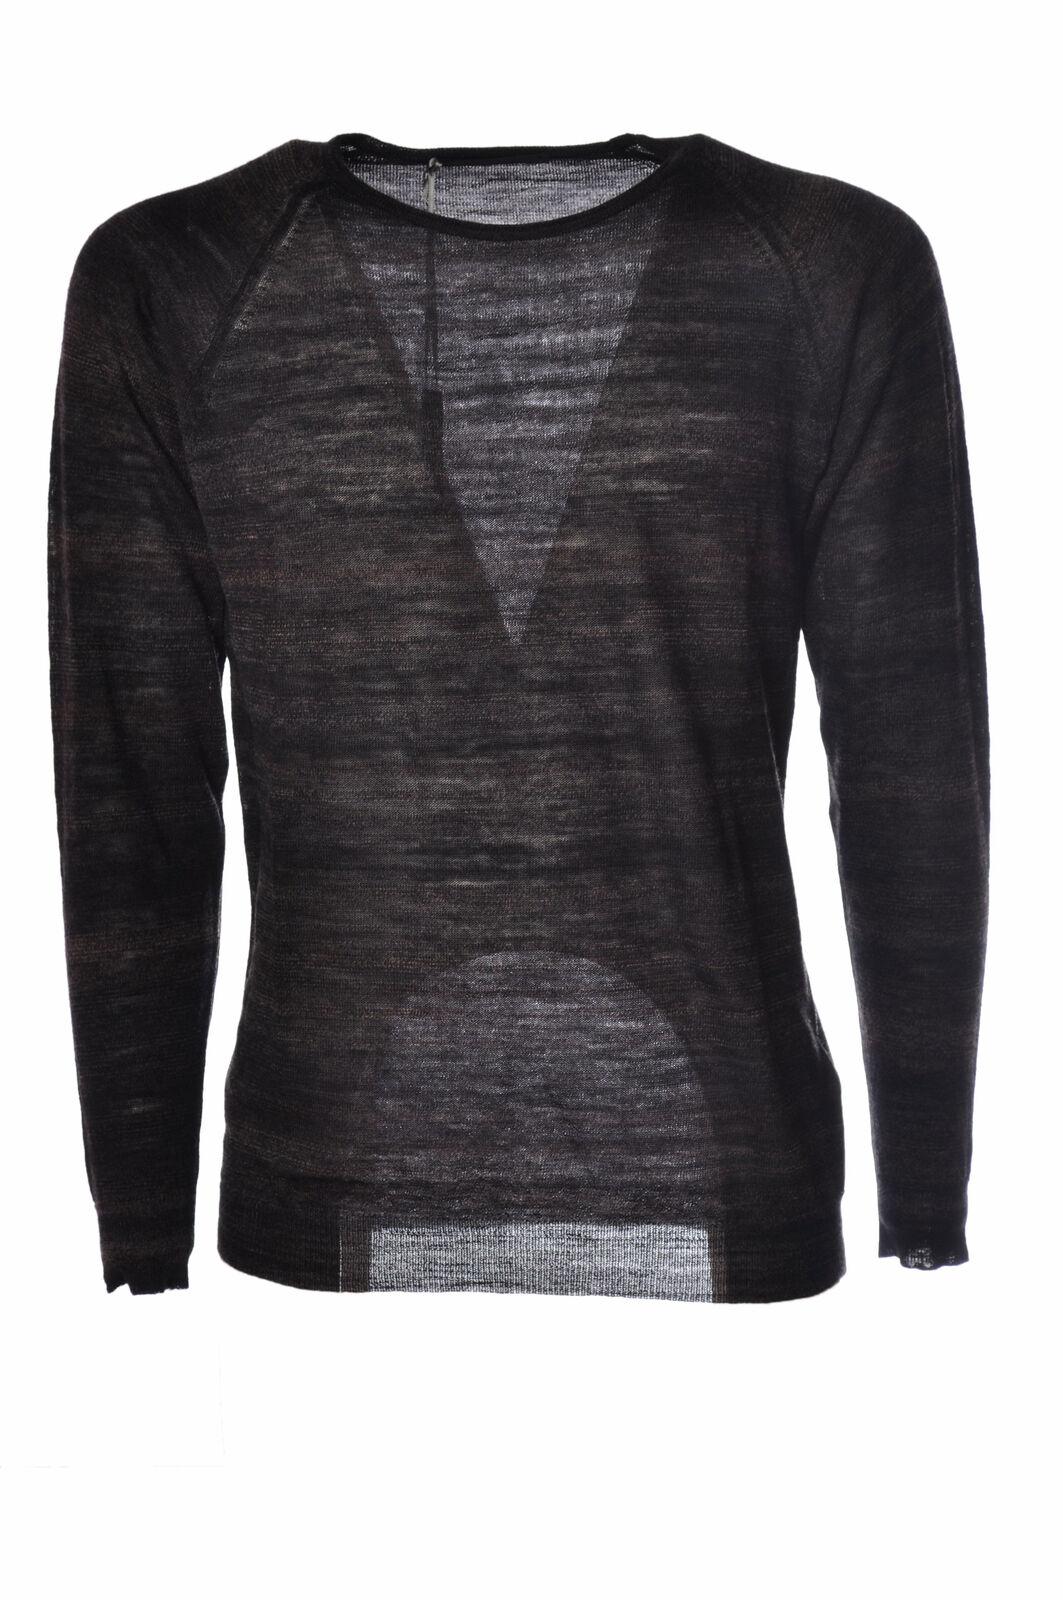 Daniele Alessandrini  -  Sweaters - Male - Brown - 2500026N173910